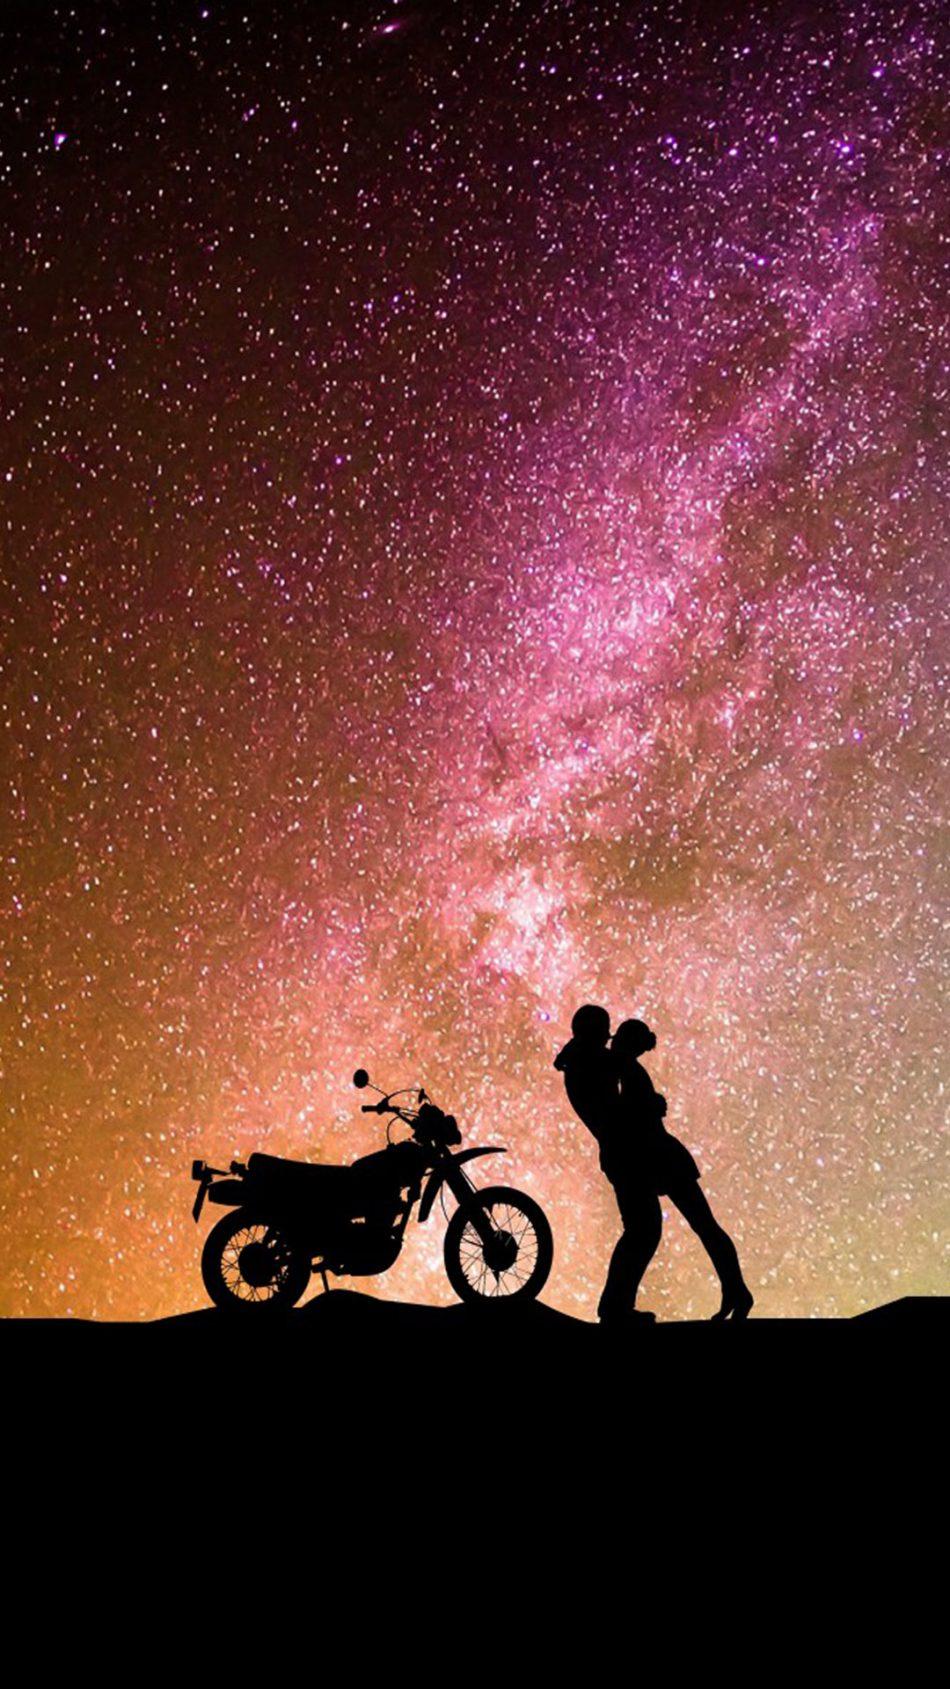 4k Wallpaper Motorcycle Posted By Samantha Tremblay